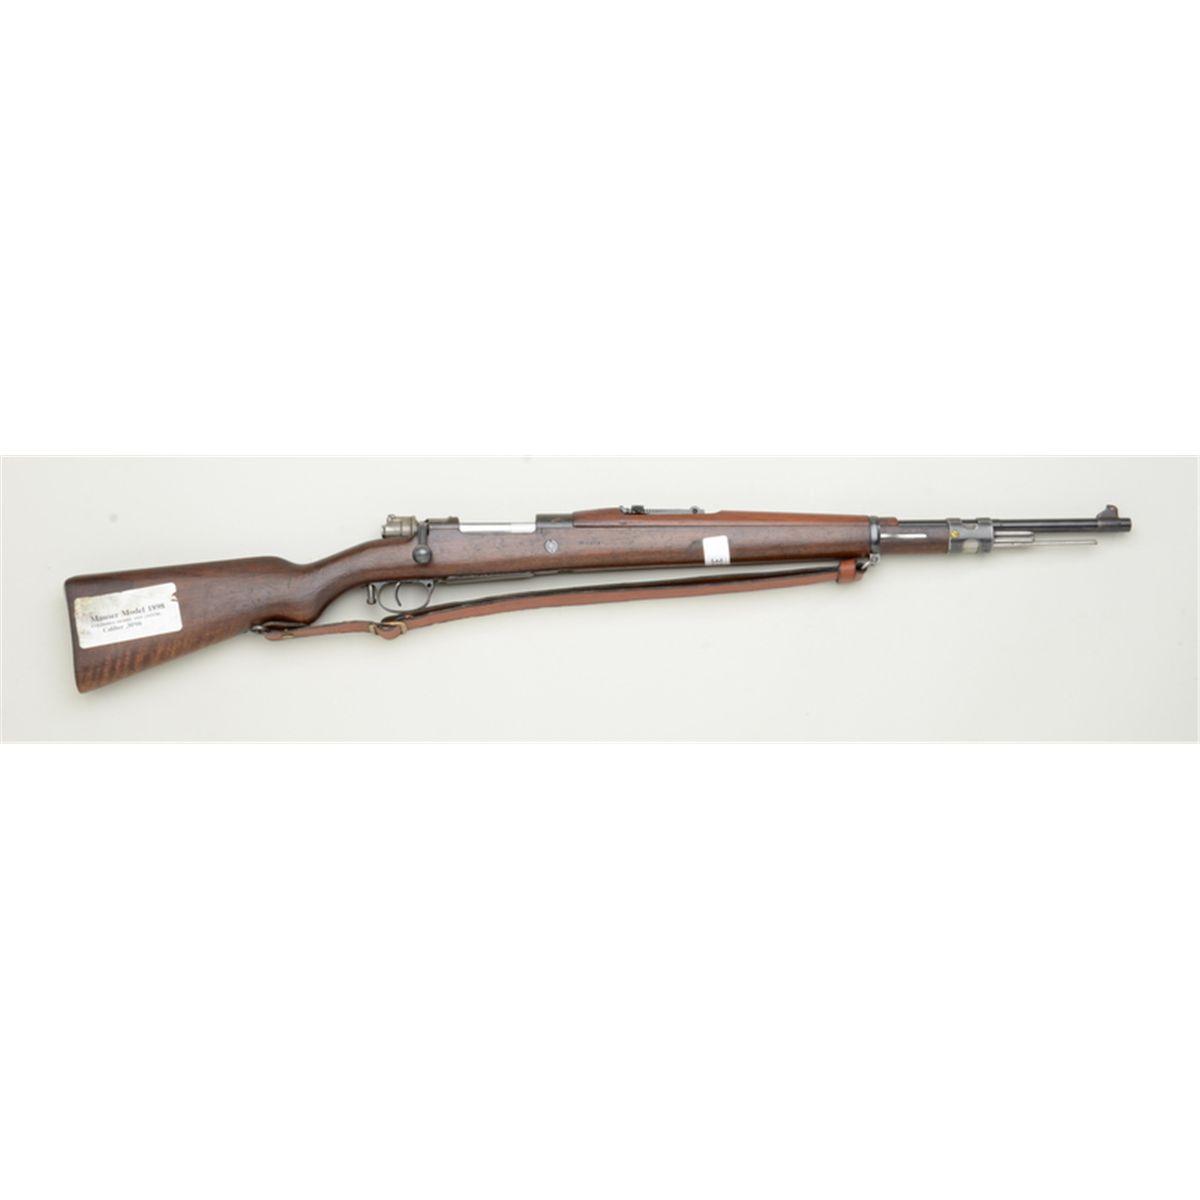 Mauser Model 98 bolt-action rifle, Columbian Crest,  30-06 cal